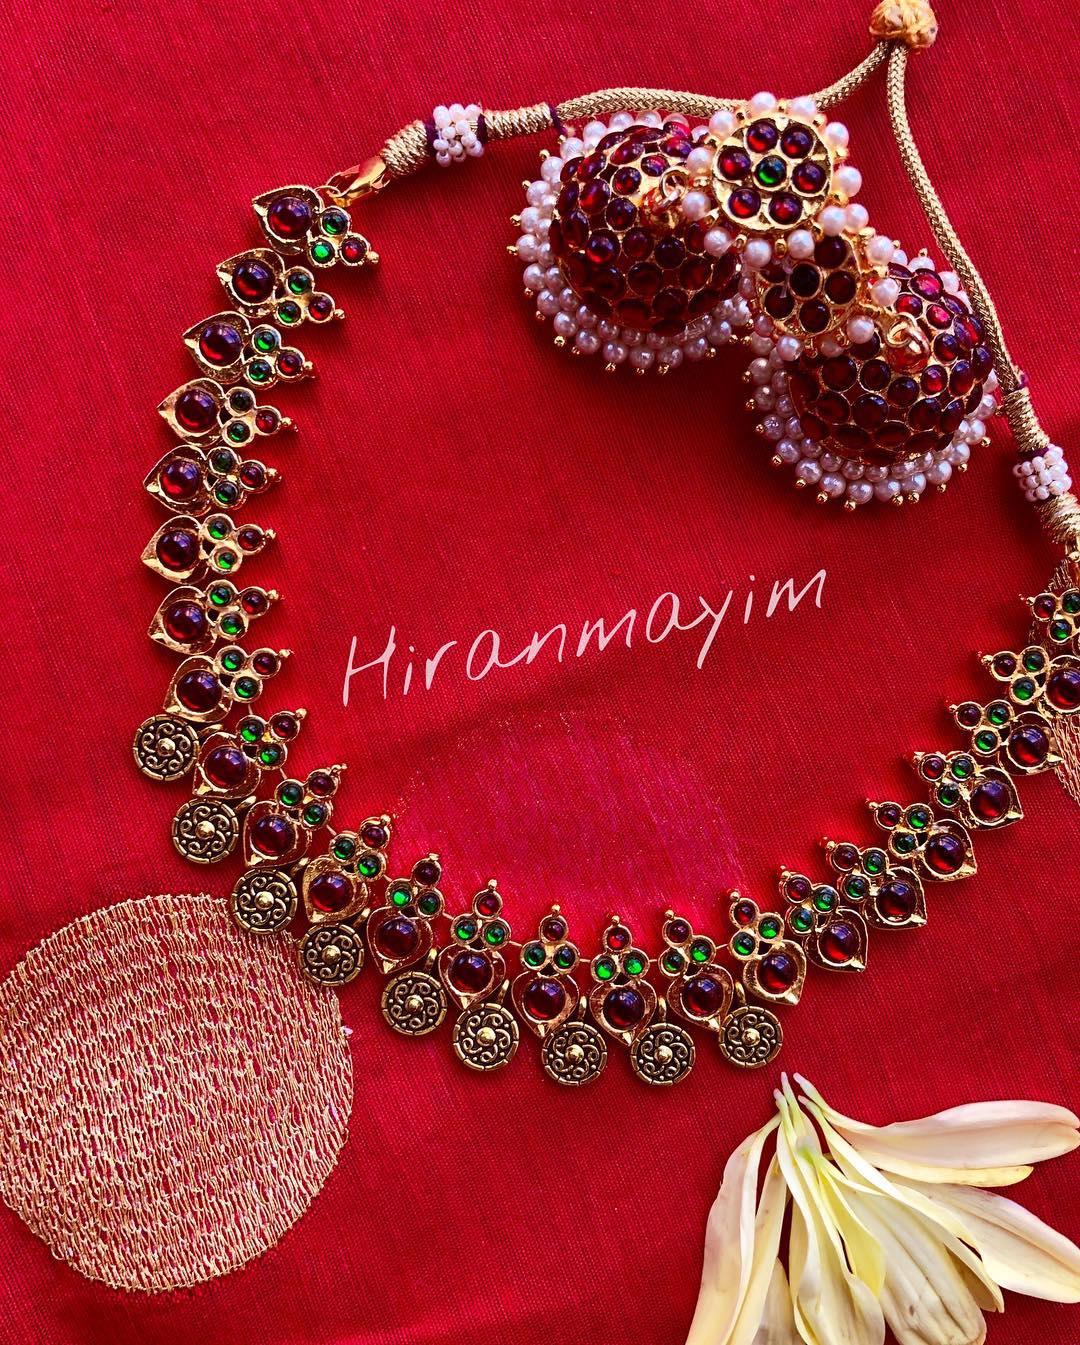 kemp-jewellery-designs-shop-online (7)